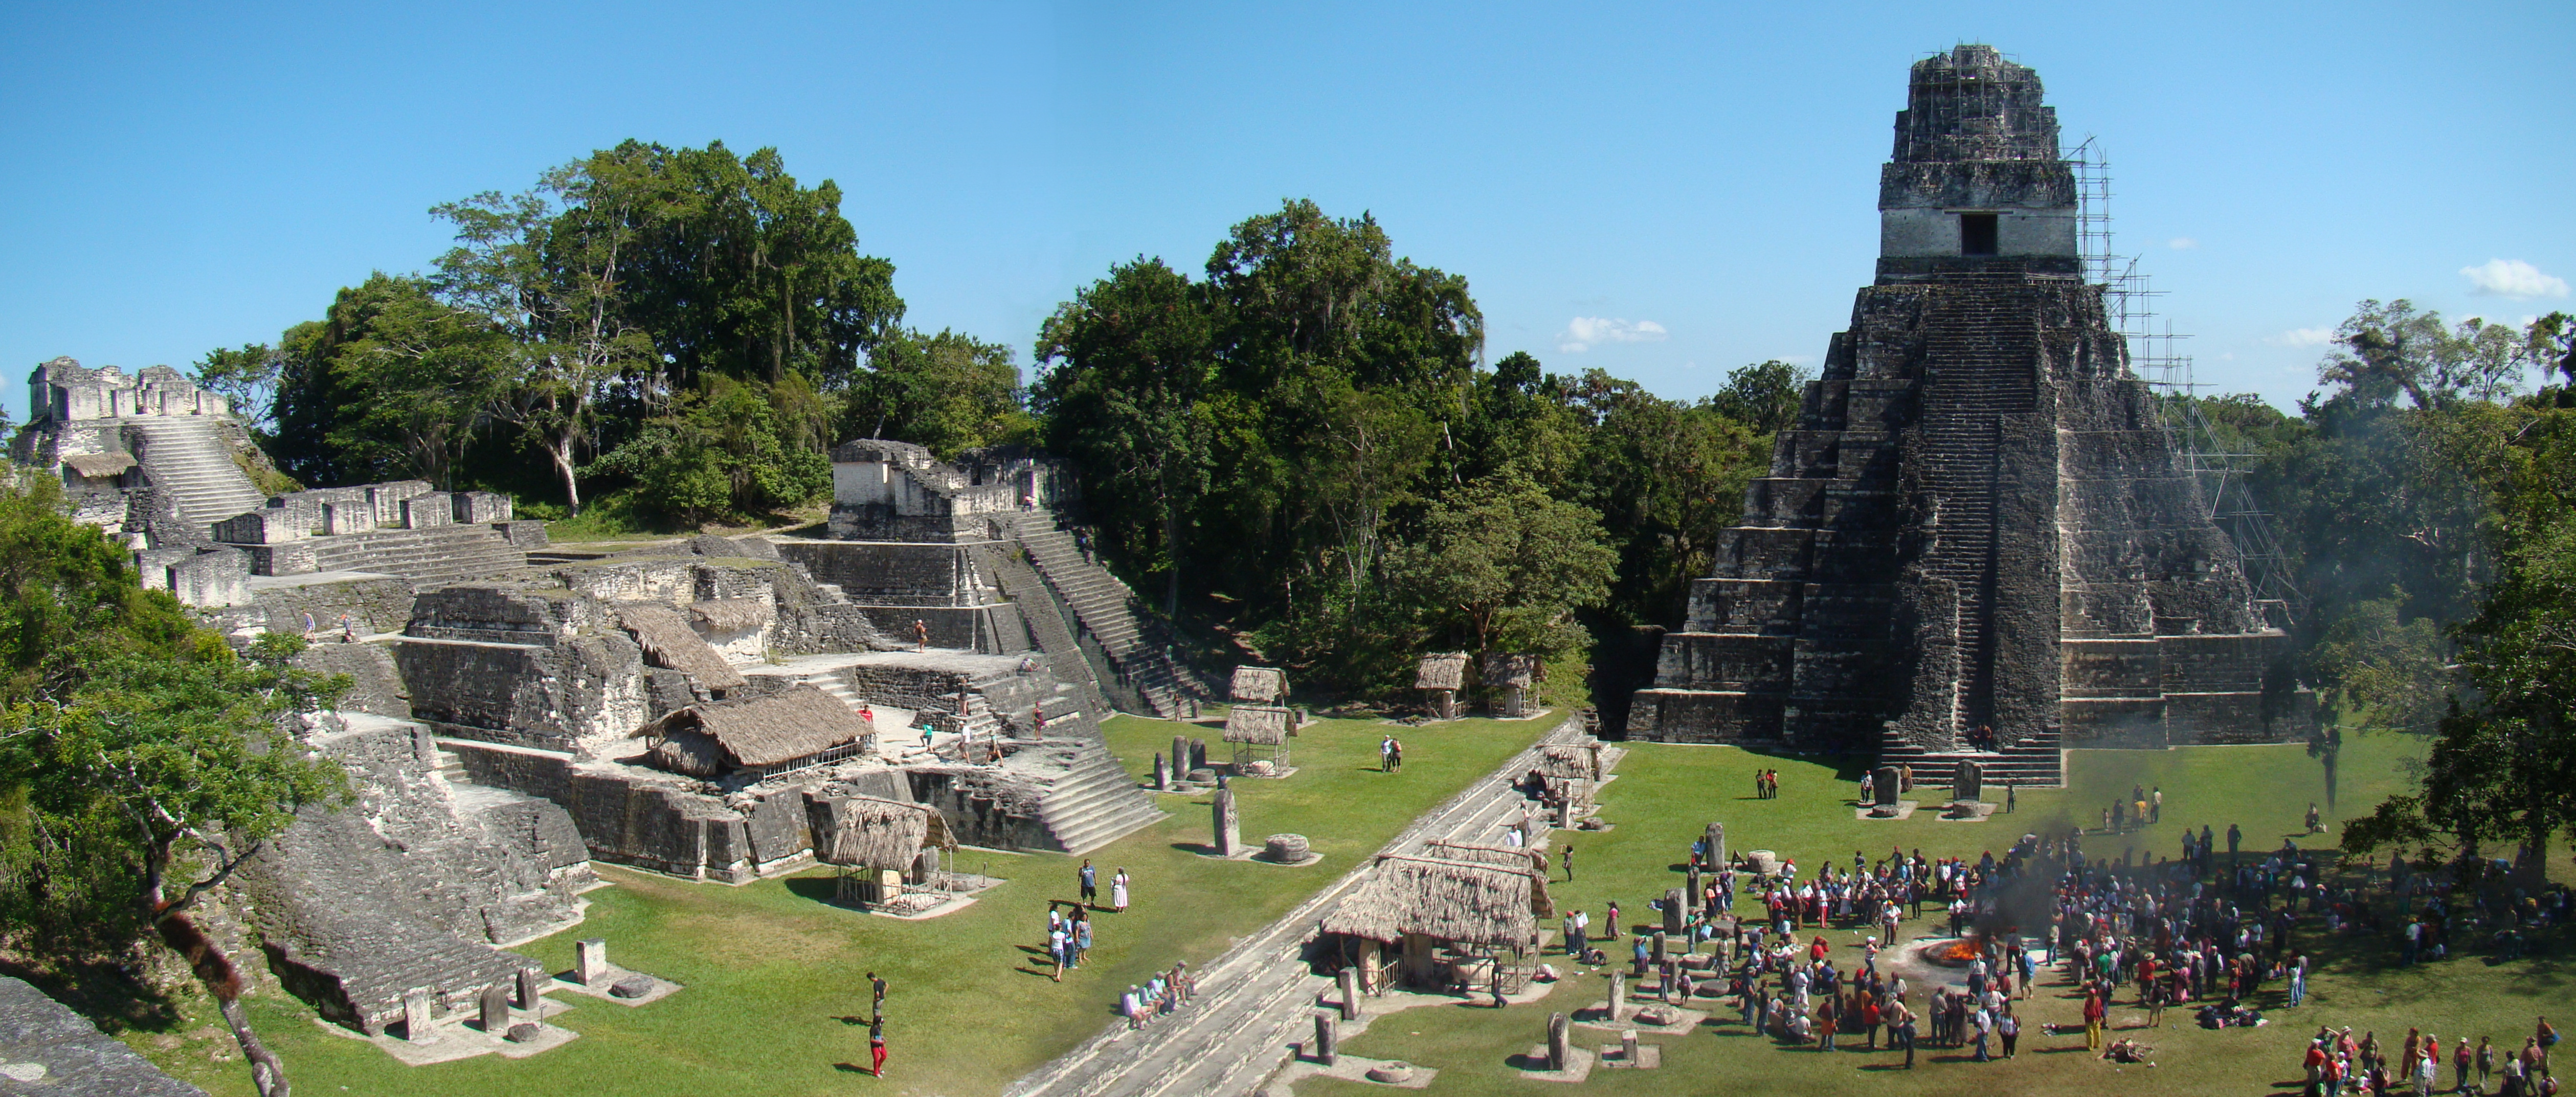 guatemala costa rica: